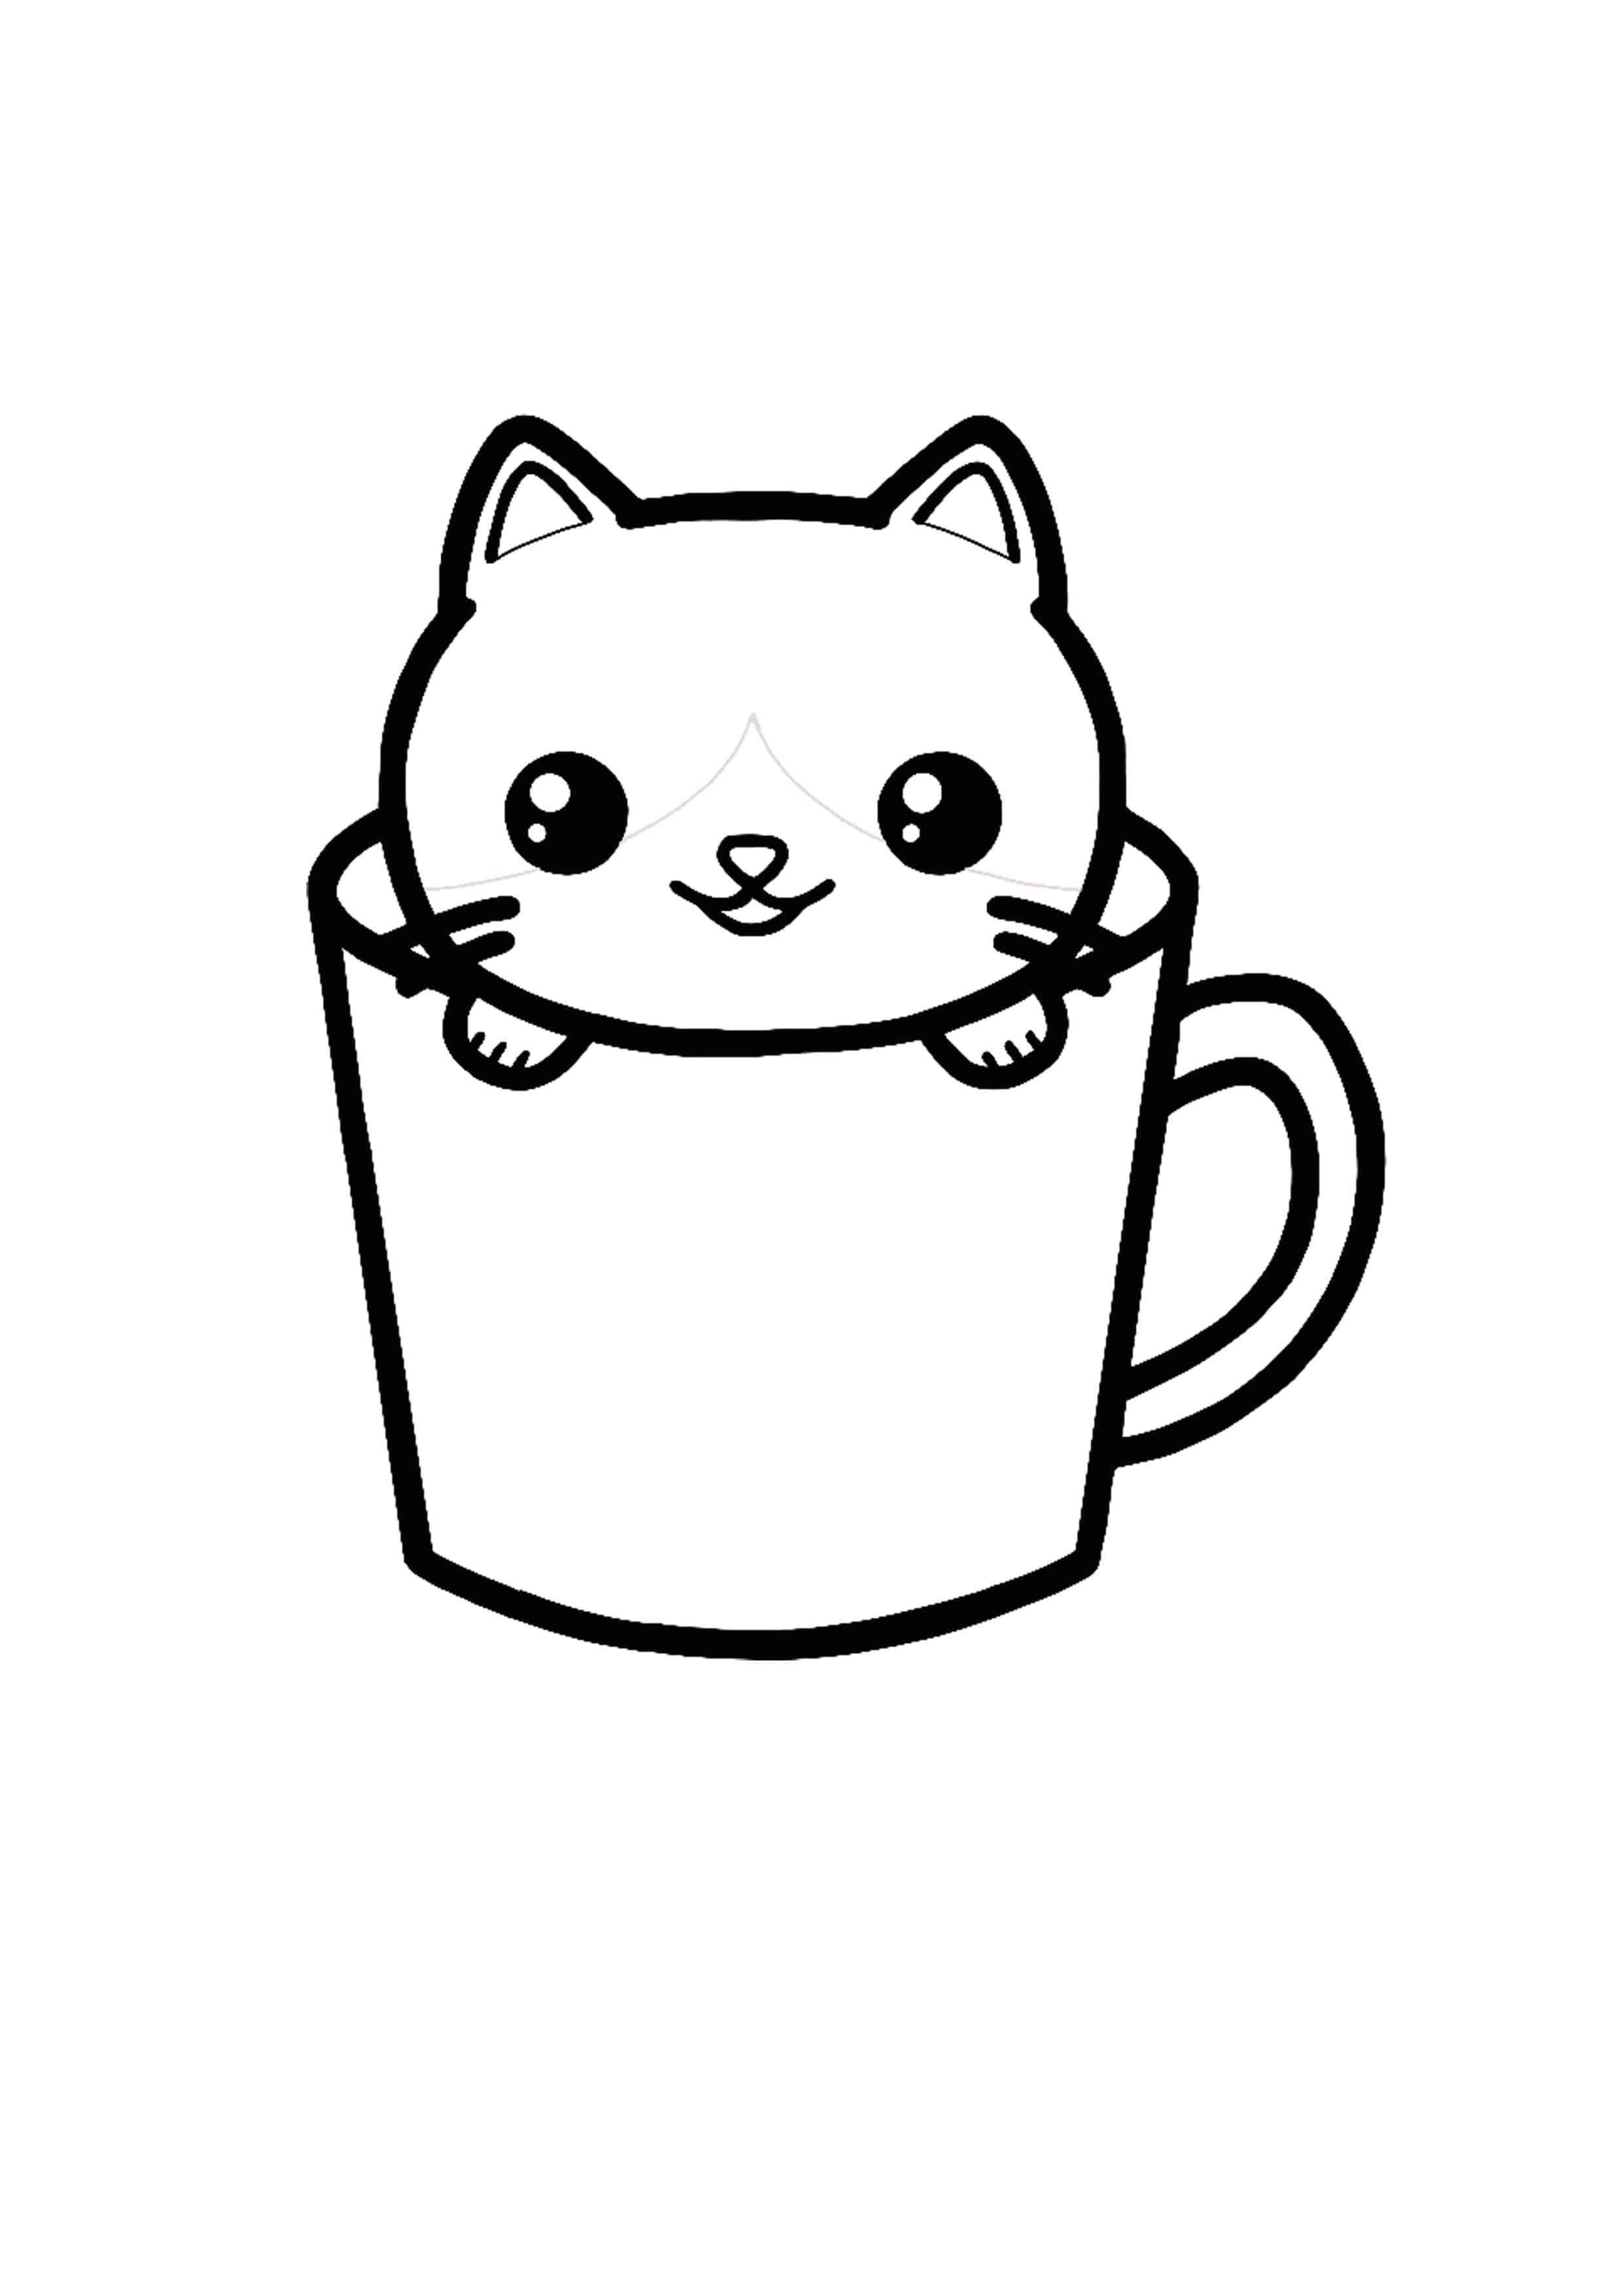 Kawaii Cat Teacup Coloring Page Cat Coloring Page Kitty Coloring Coloring Pages